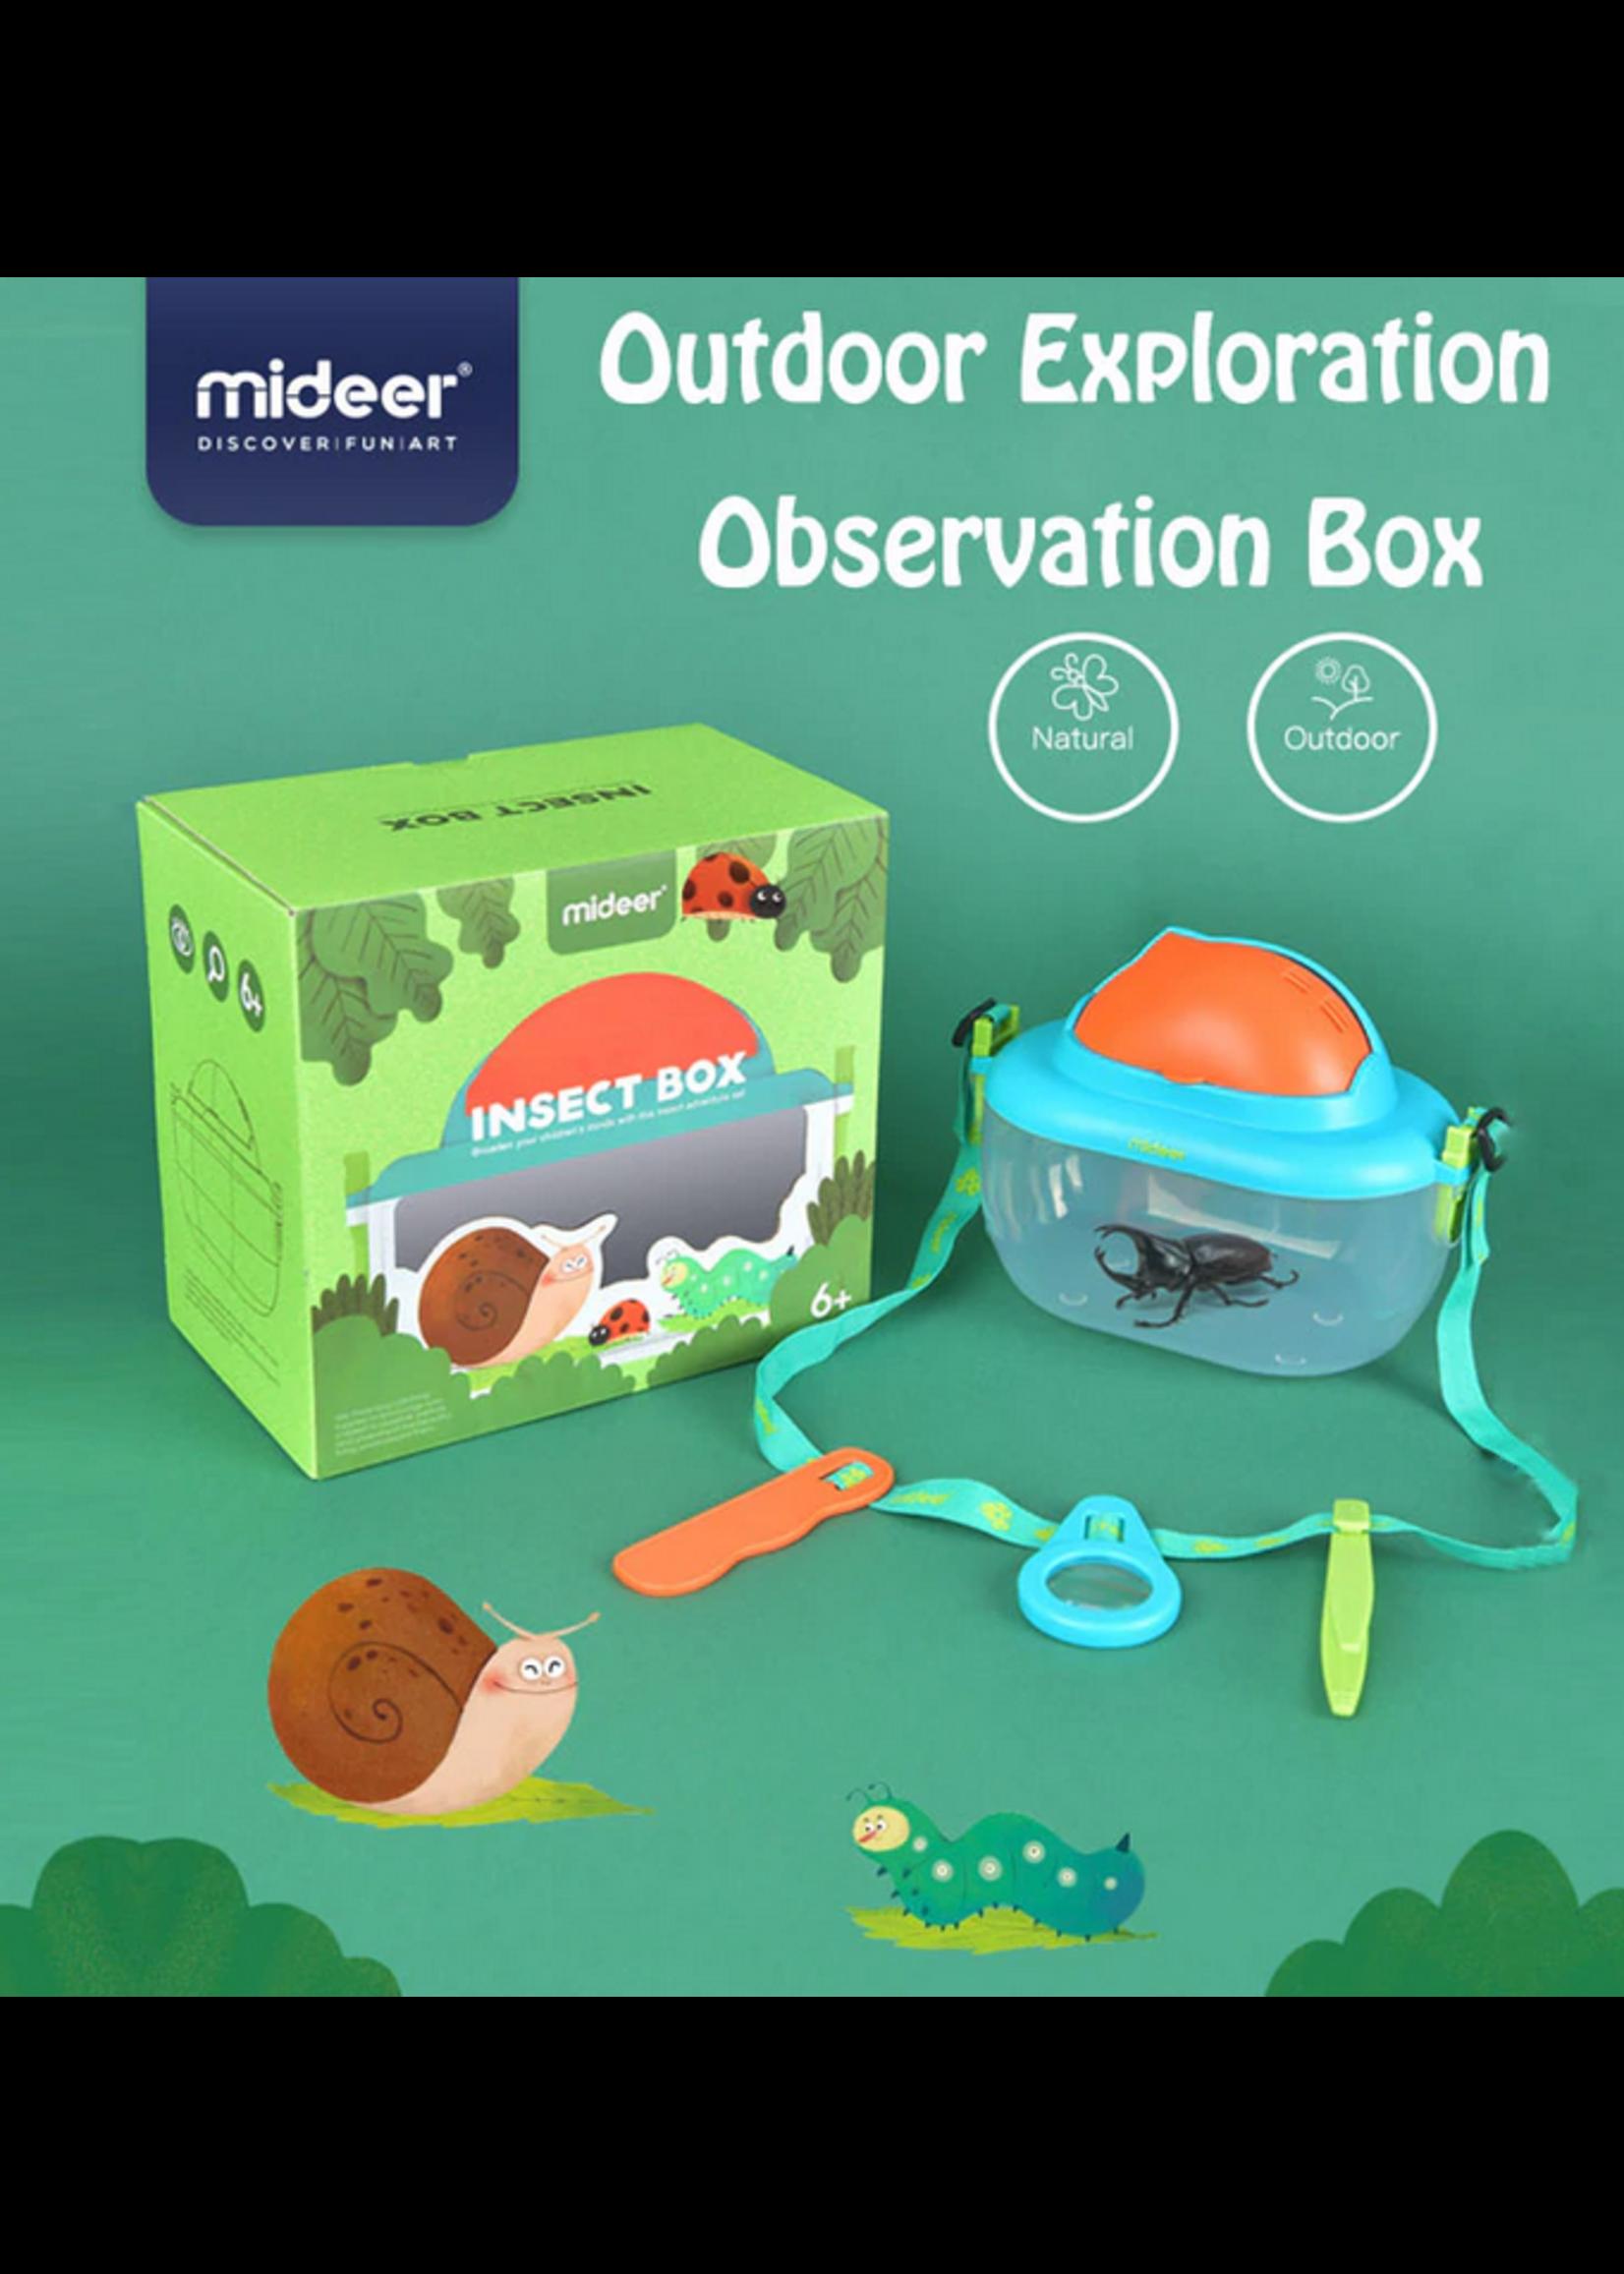 Mideer Mideer Insect Box